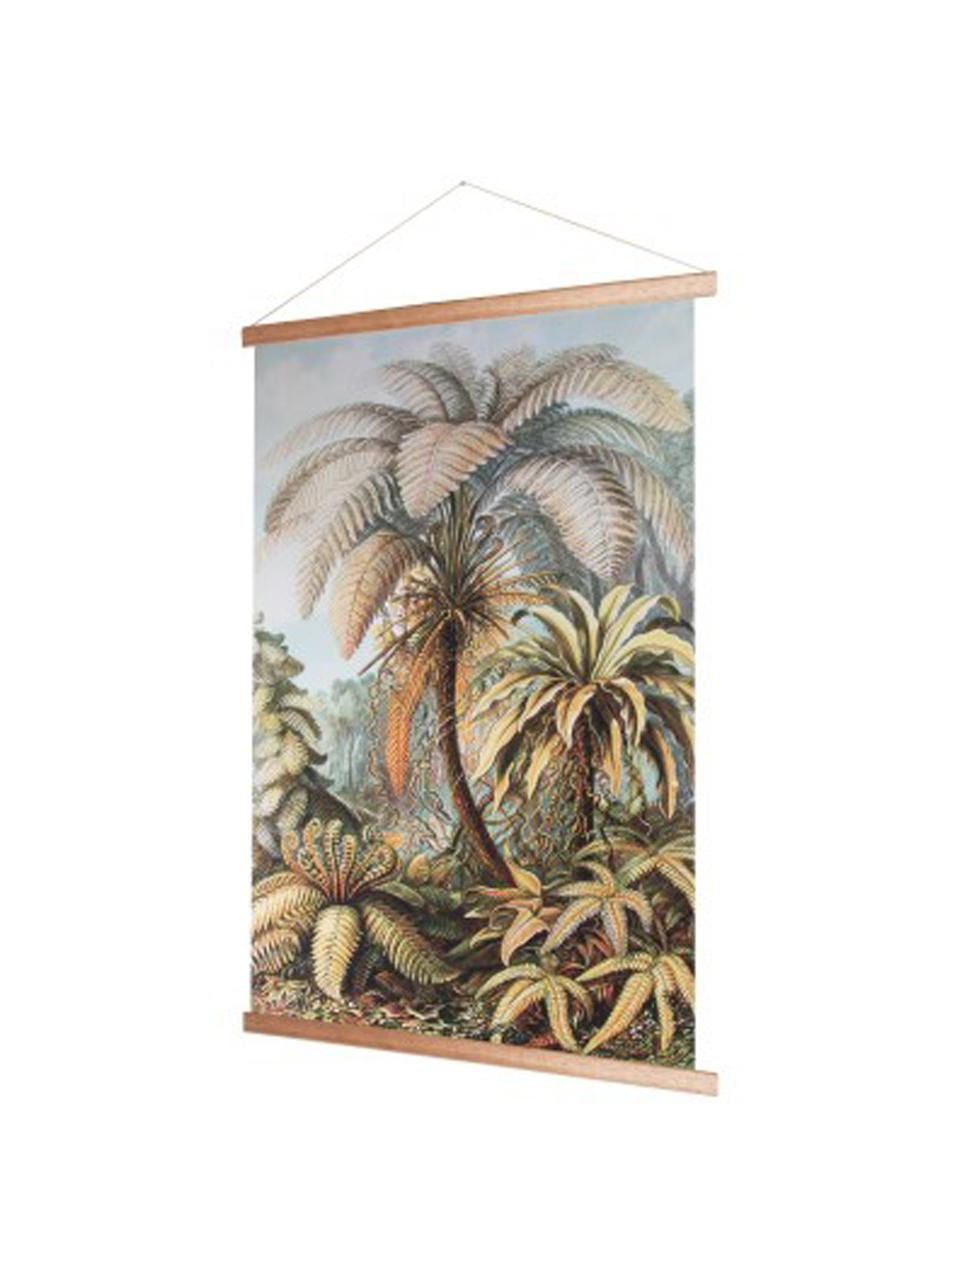 Wandobjekt Jungle, Bild: Baumwolle, Rahmen: Holz, Mehrfarbig, 70 x 100 cm